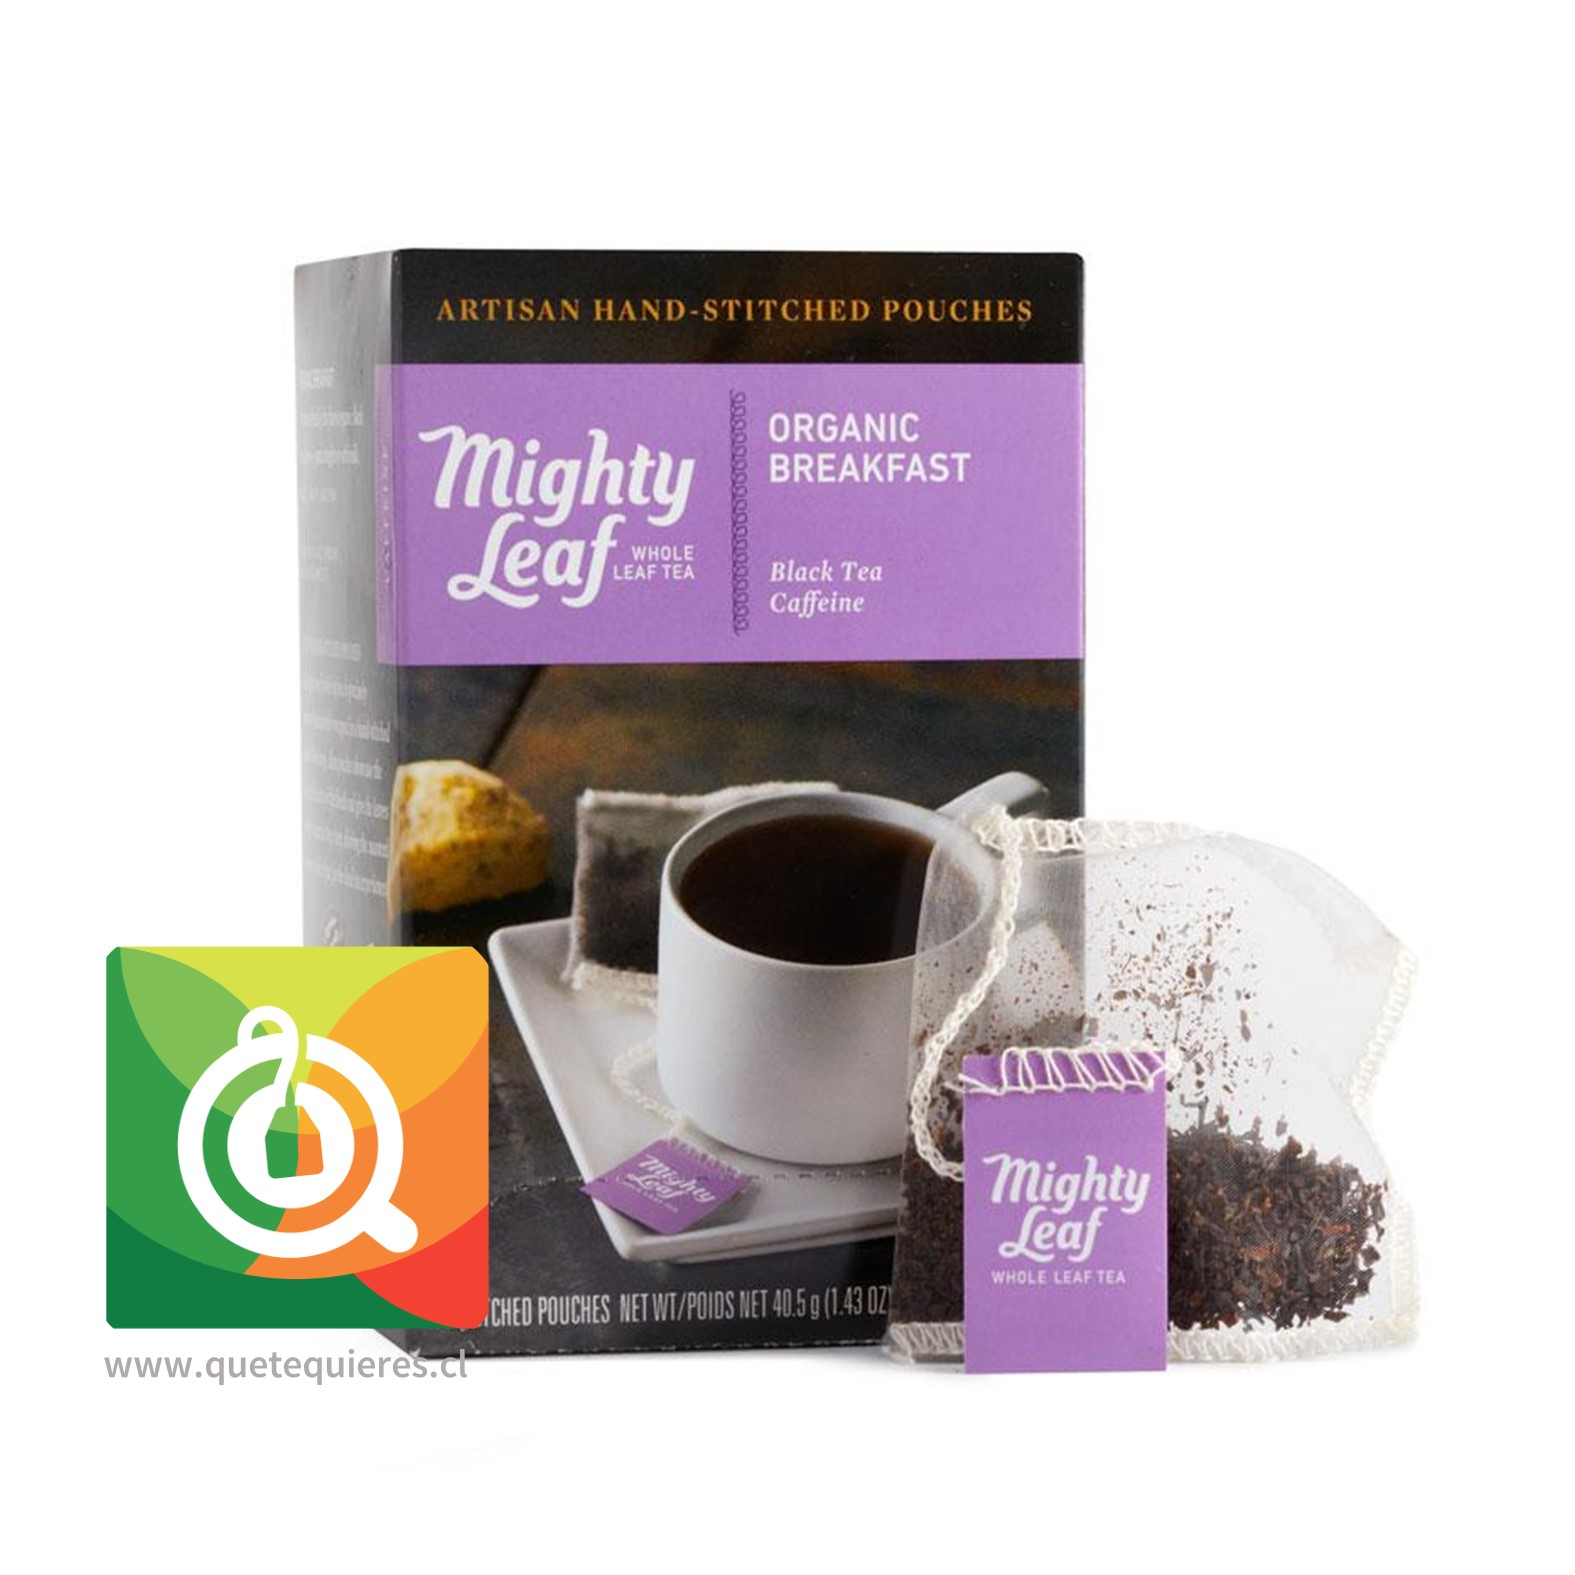 Mighty Leaf Breakfast Orgánico- Image 1